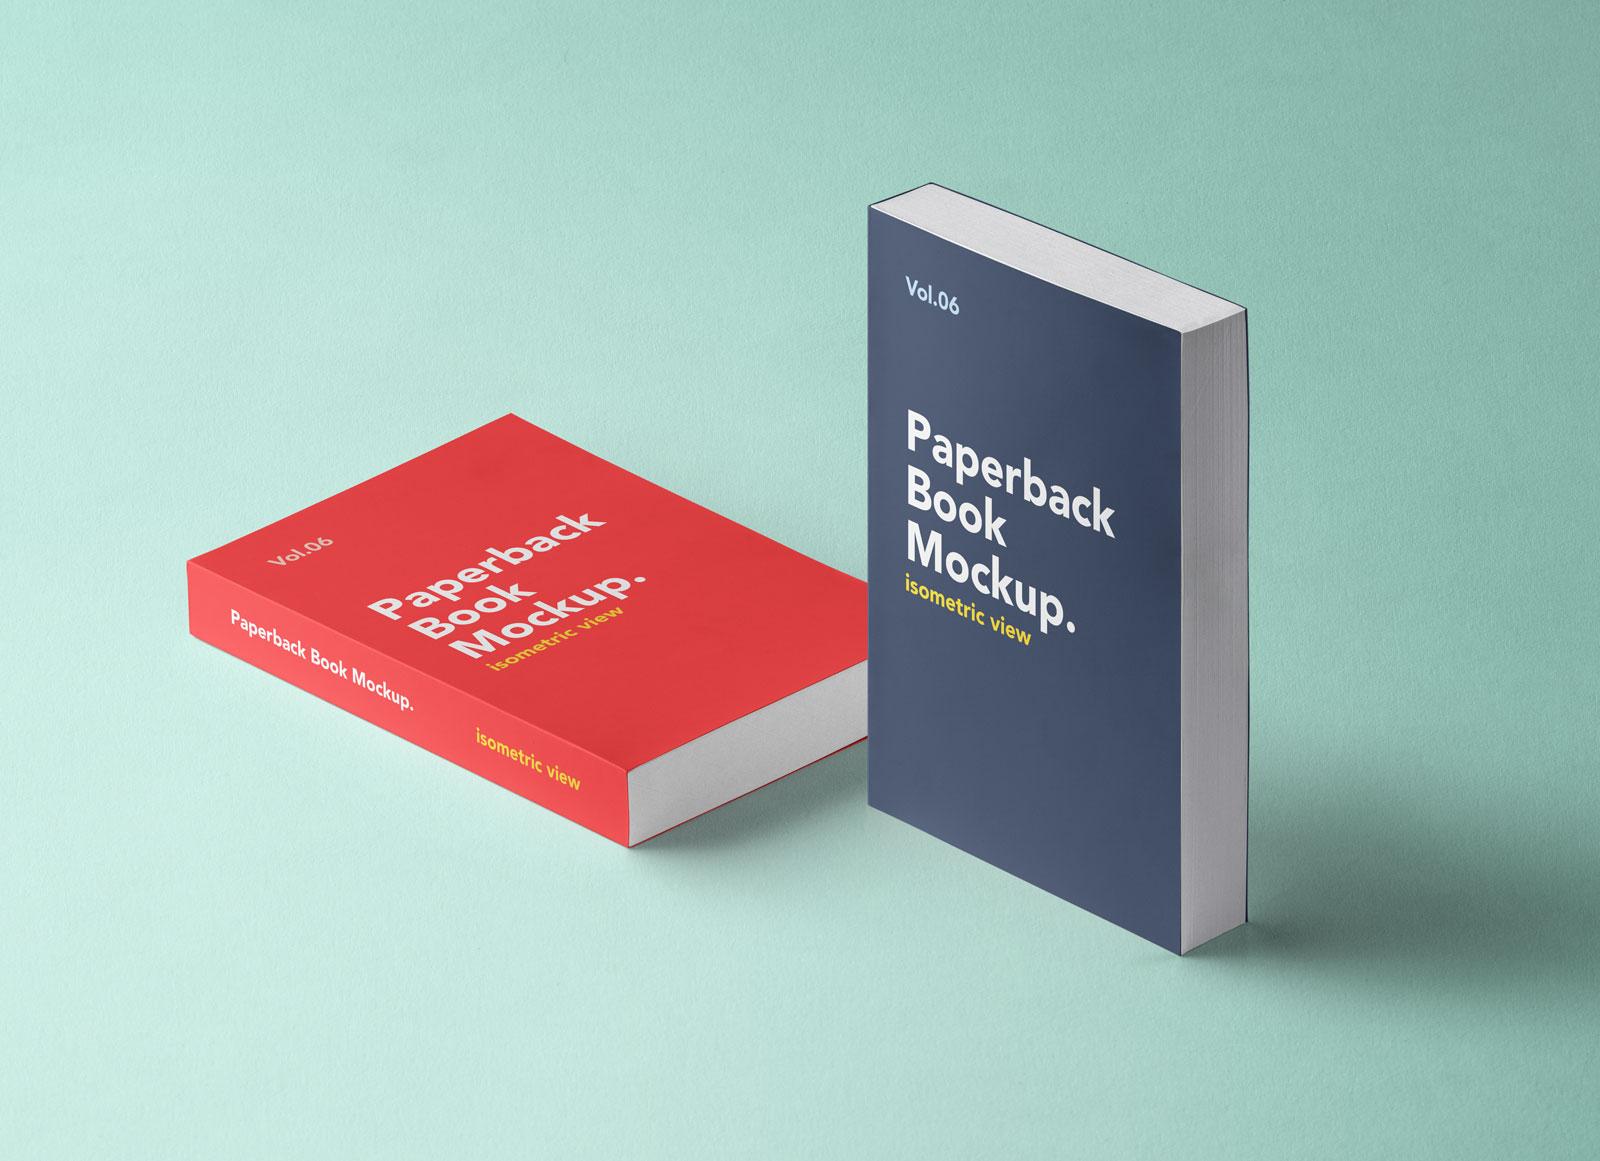 Free-Paperback-Book-Mockup-PSD